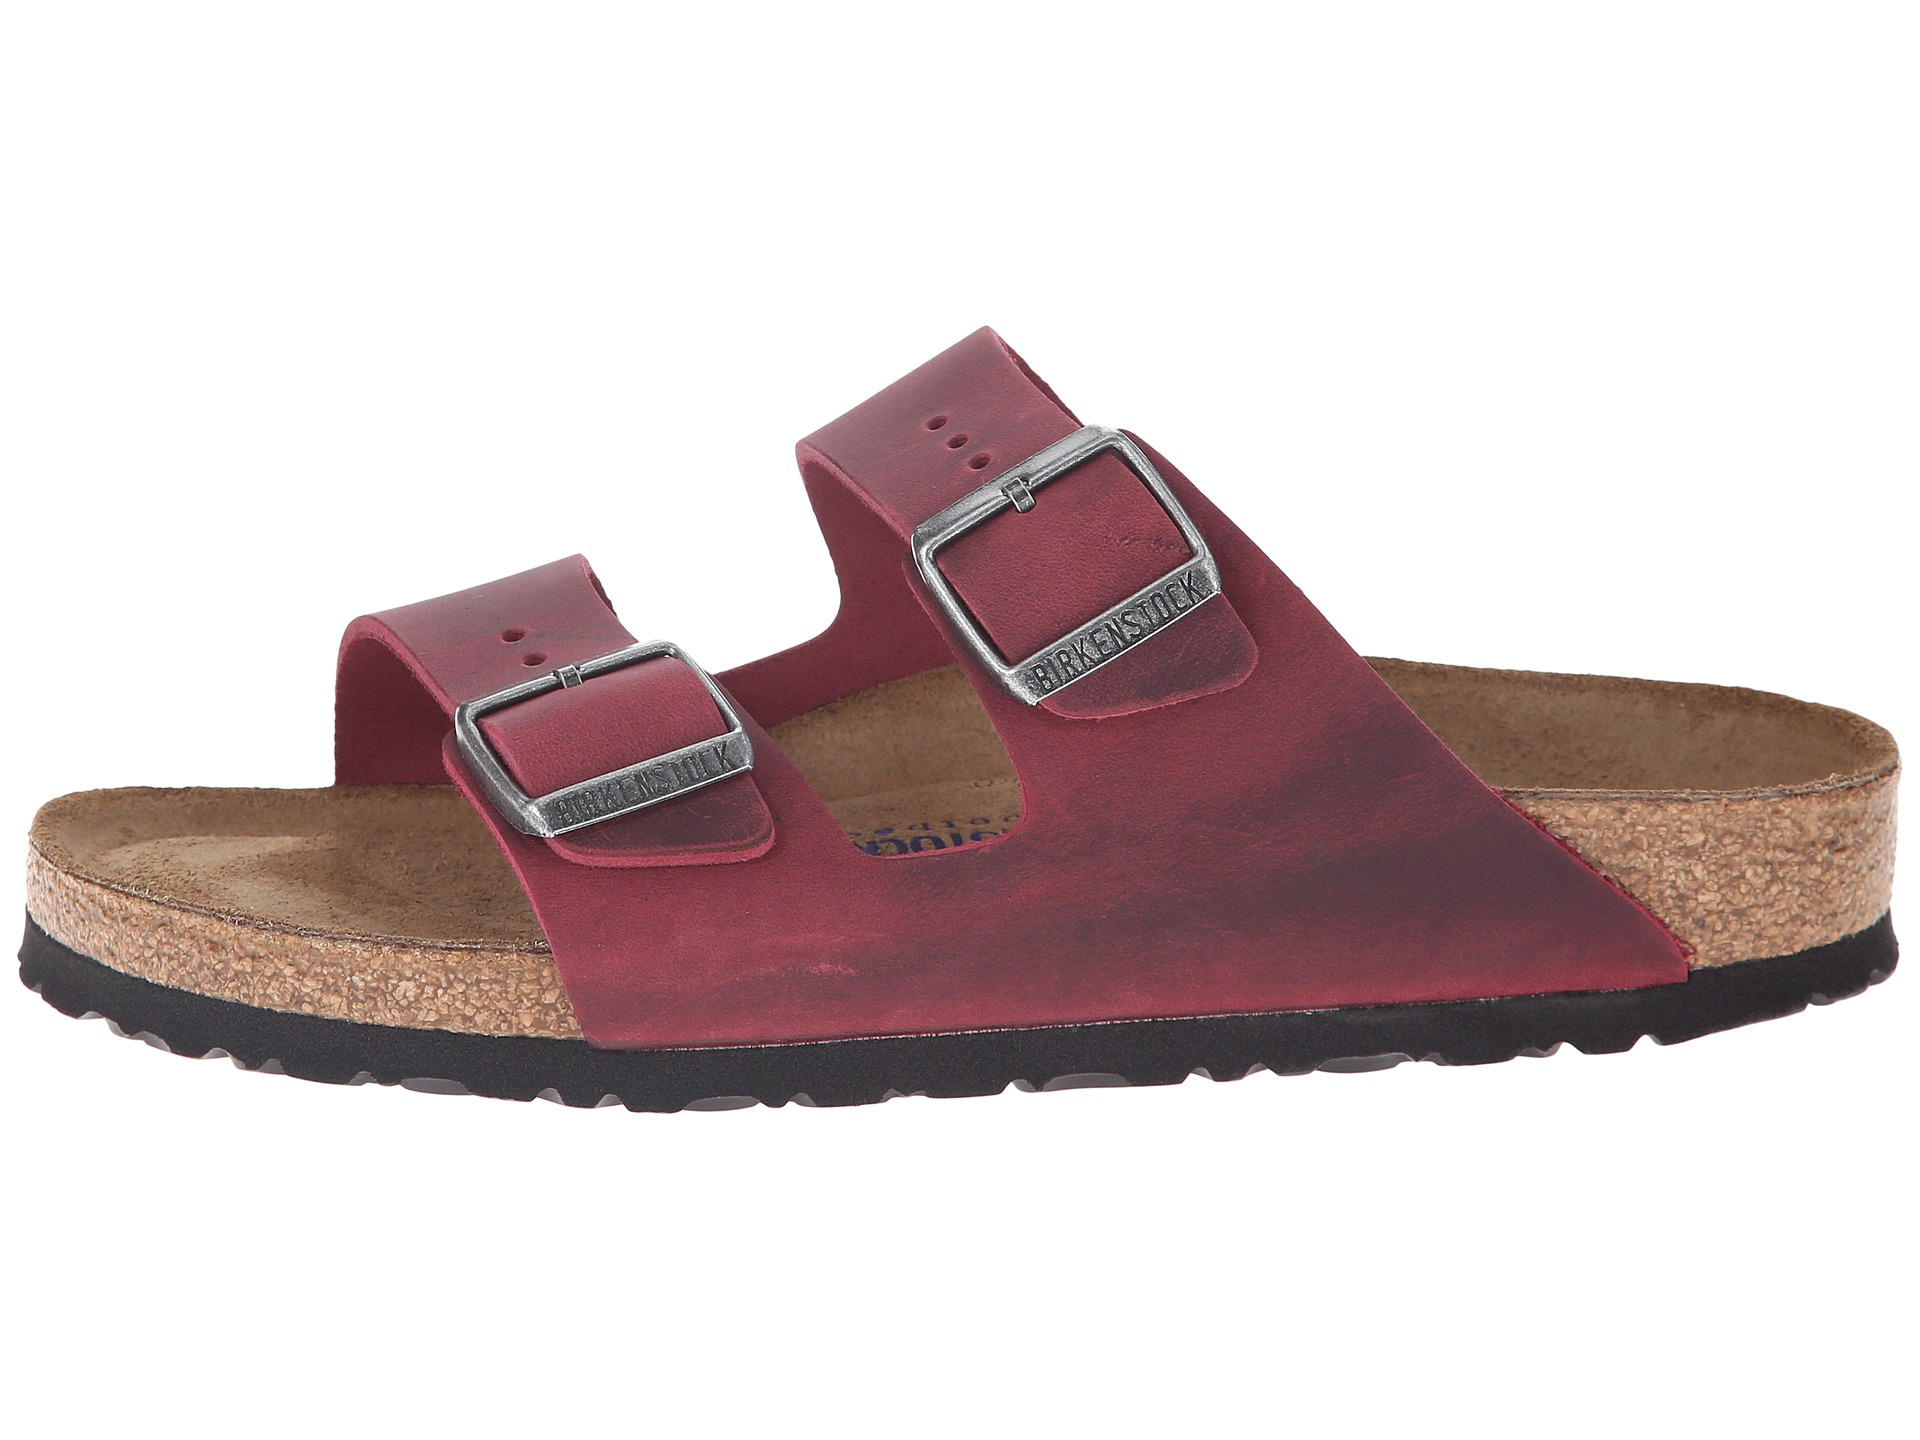 Lyst - Birkenstock Arizona Soft Footbed in Purple